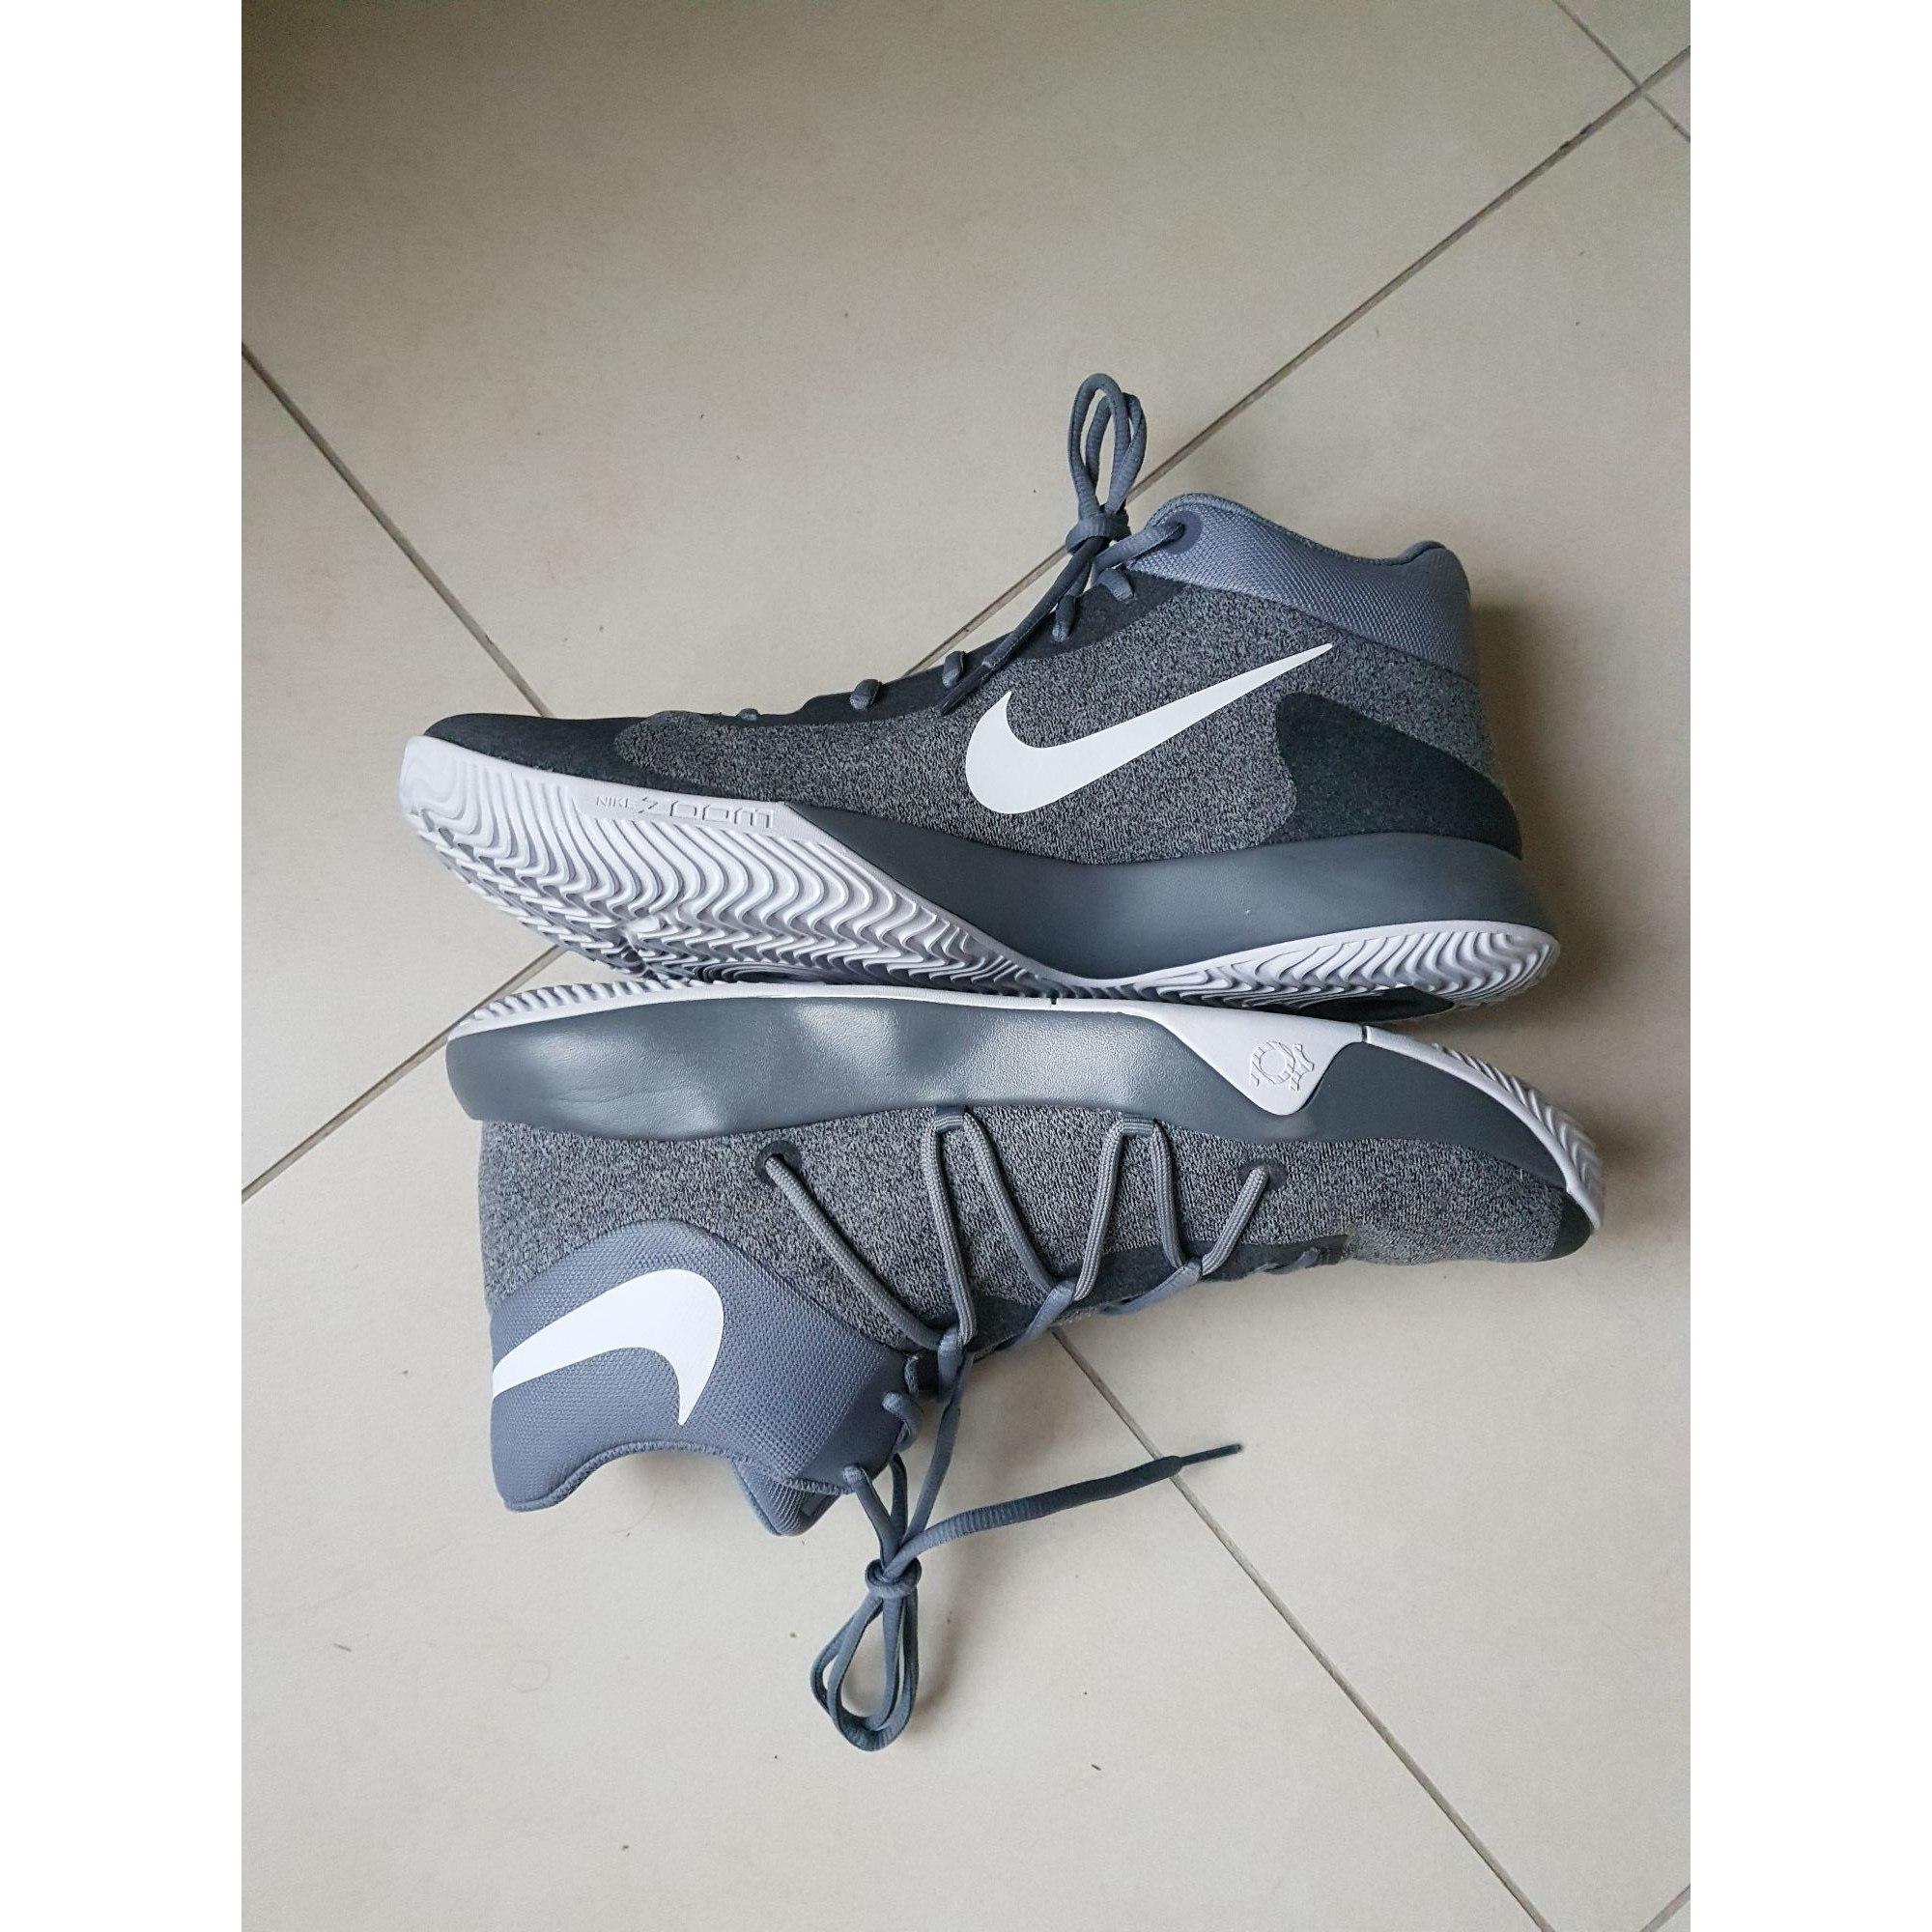 5 Gris 47 Nike Chaussures 7842421 Sport De wA8qwfS